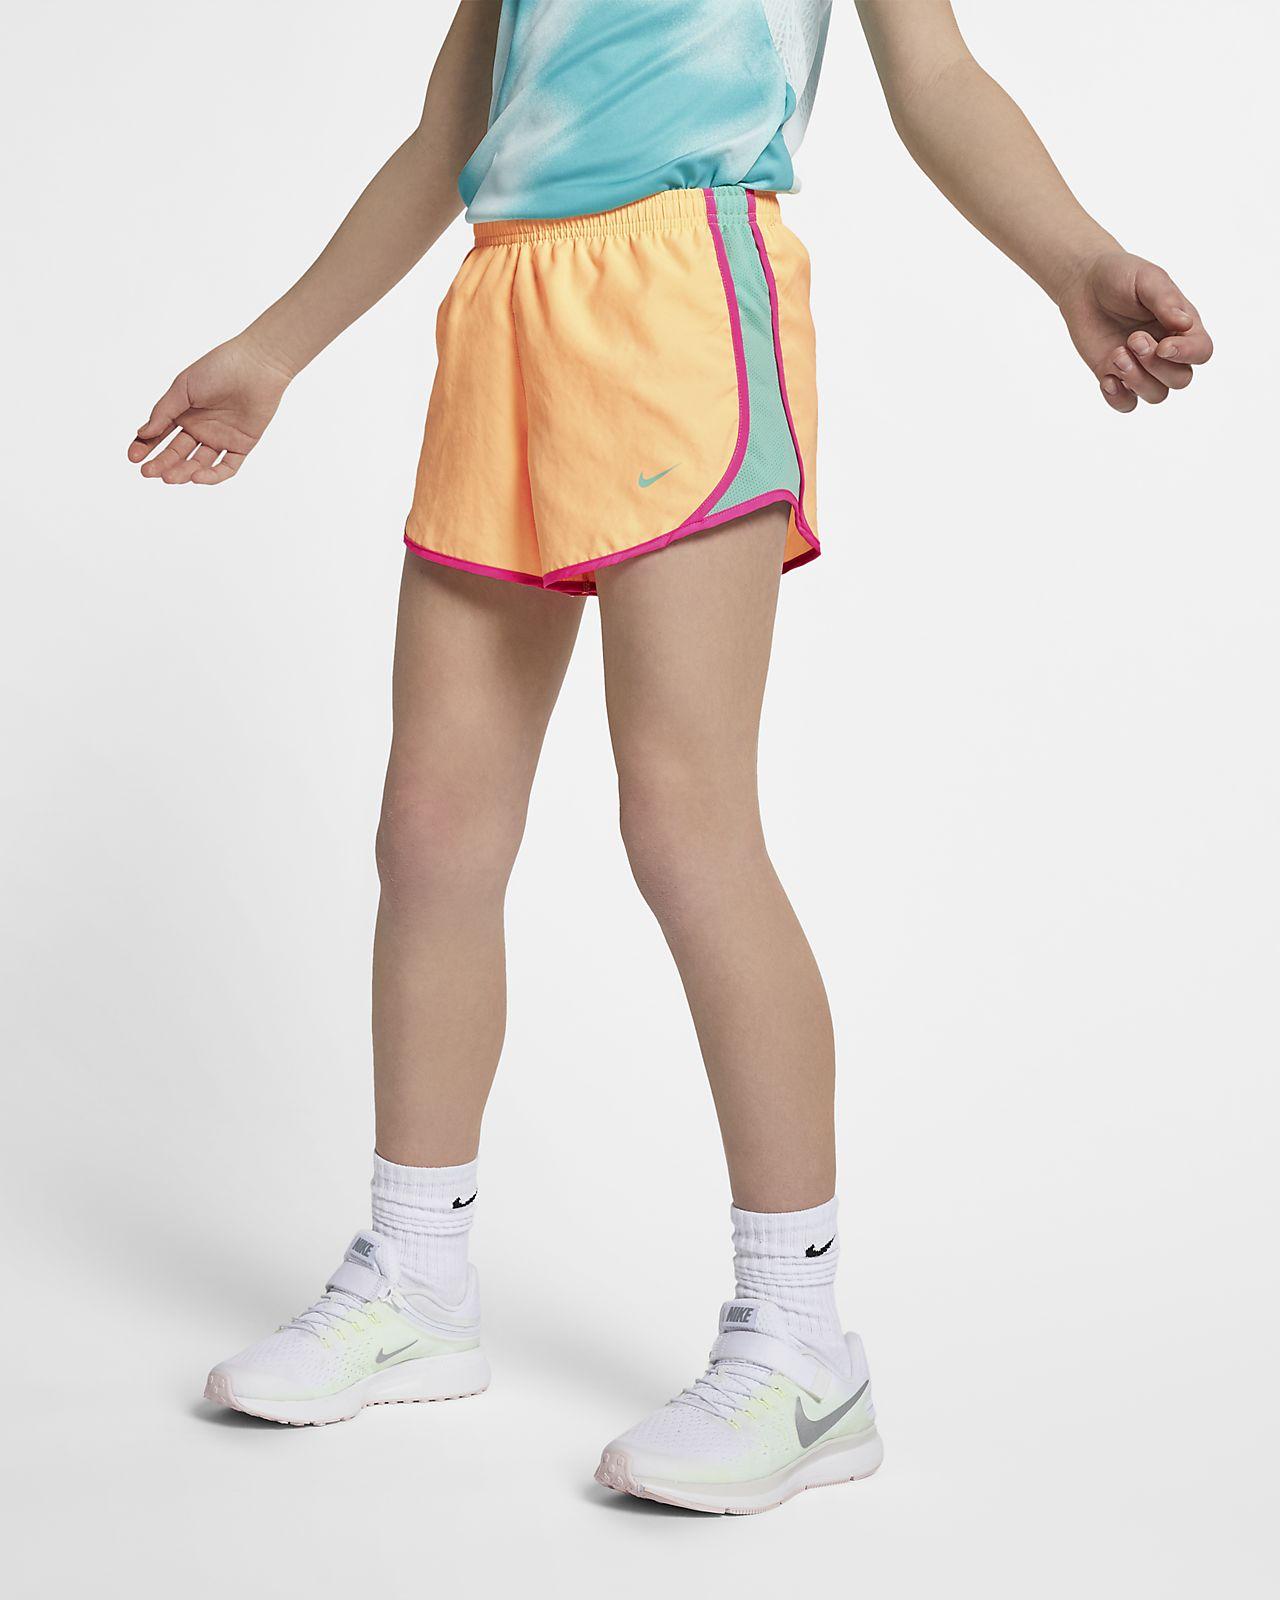 683d099274cd Nike Dri-FIT Tempo Big Kids' (Girls') Running Shorts. Nike.com